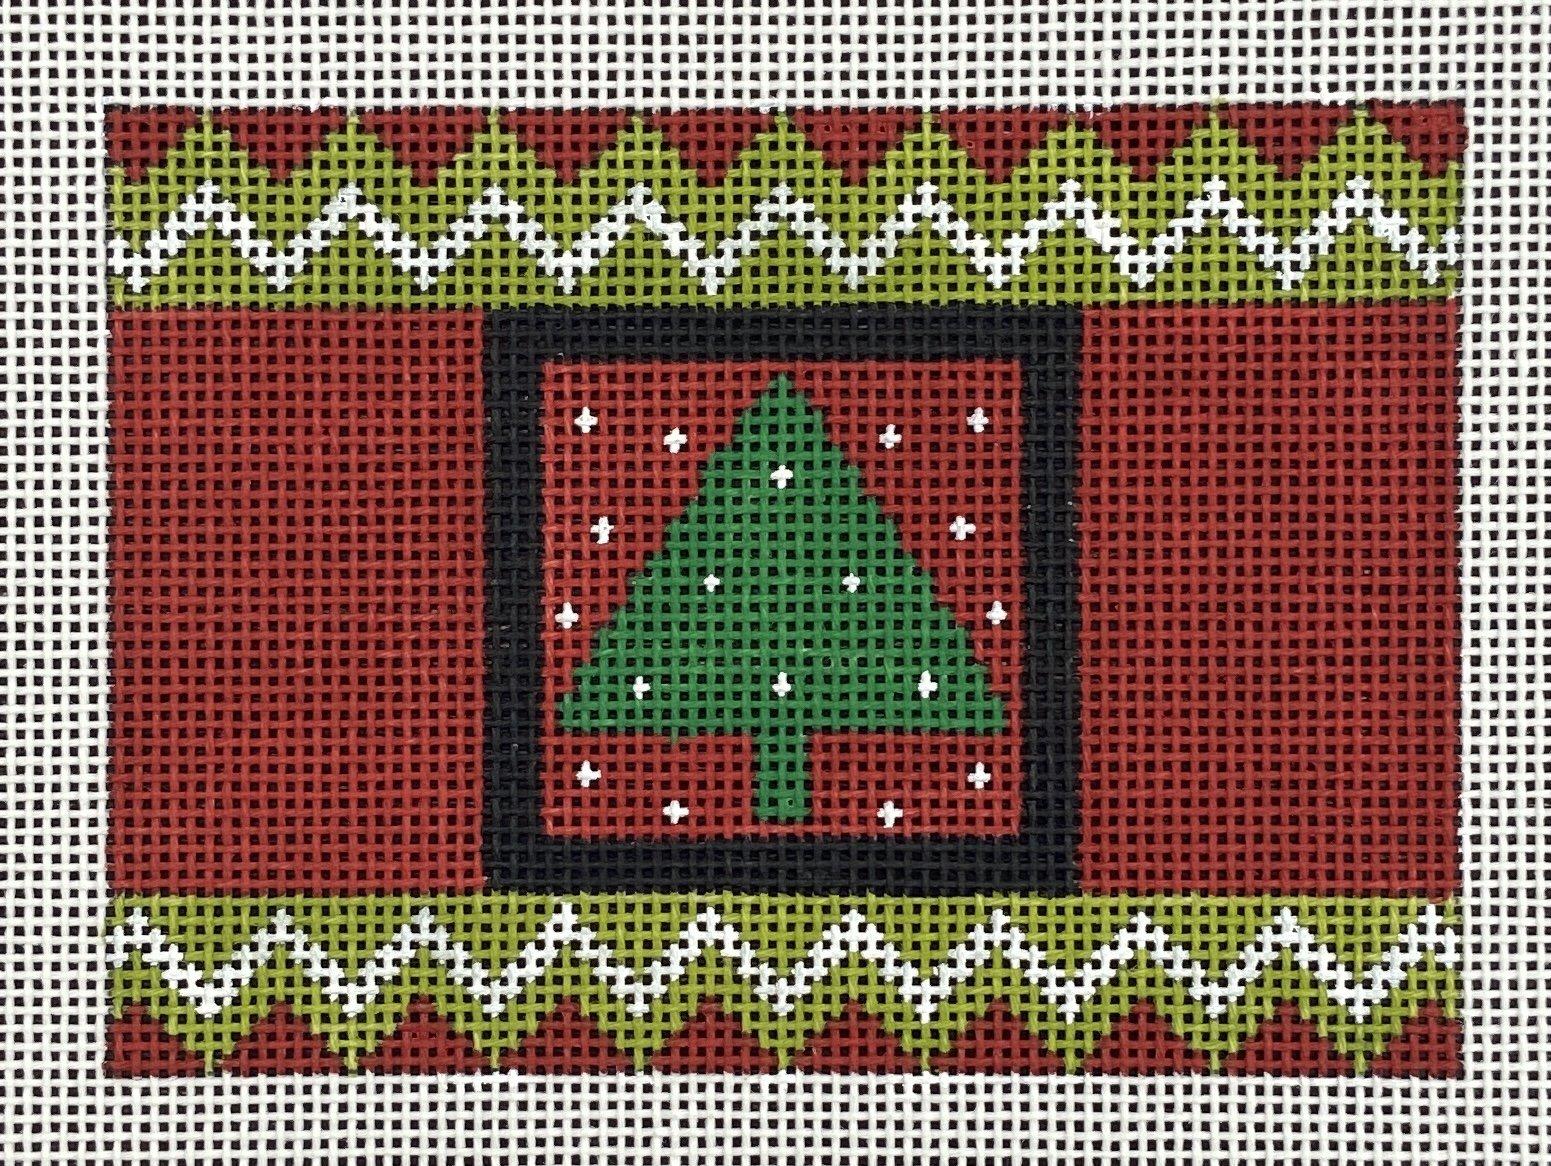 MS13662A Cracker Christmas Tree Ornament Melissa Shirley